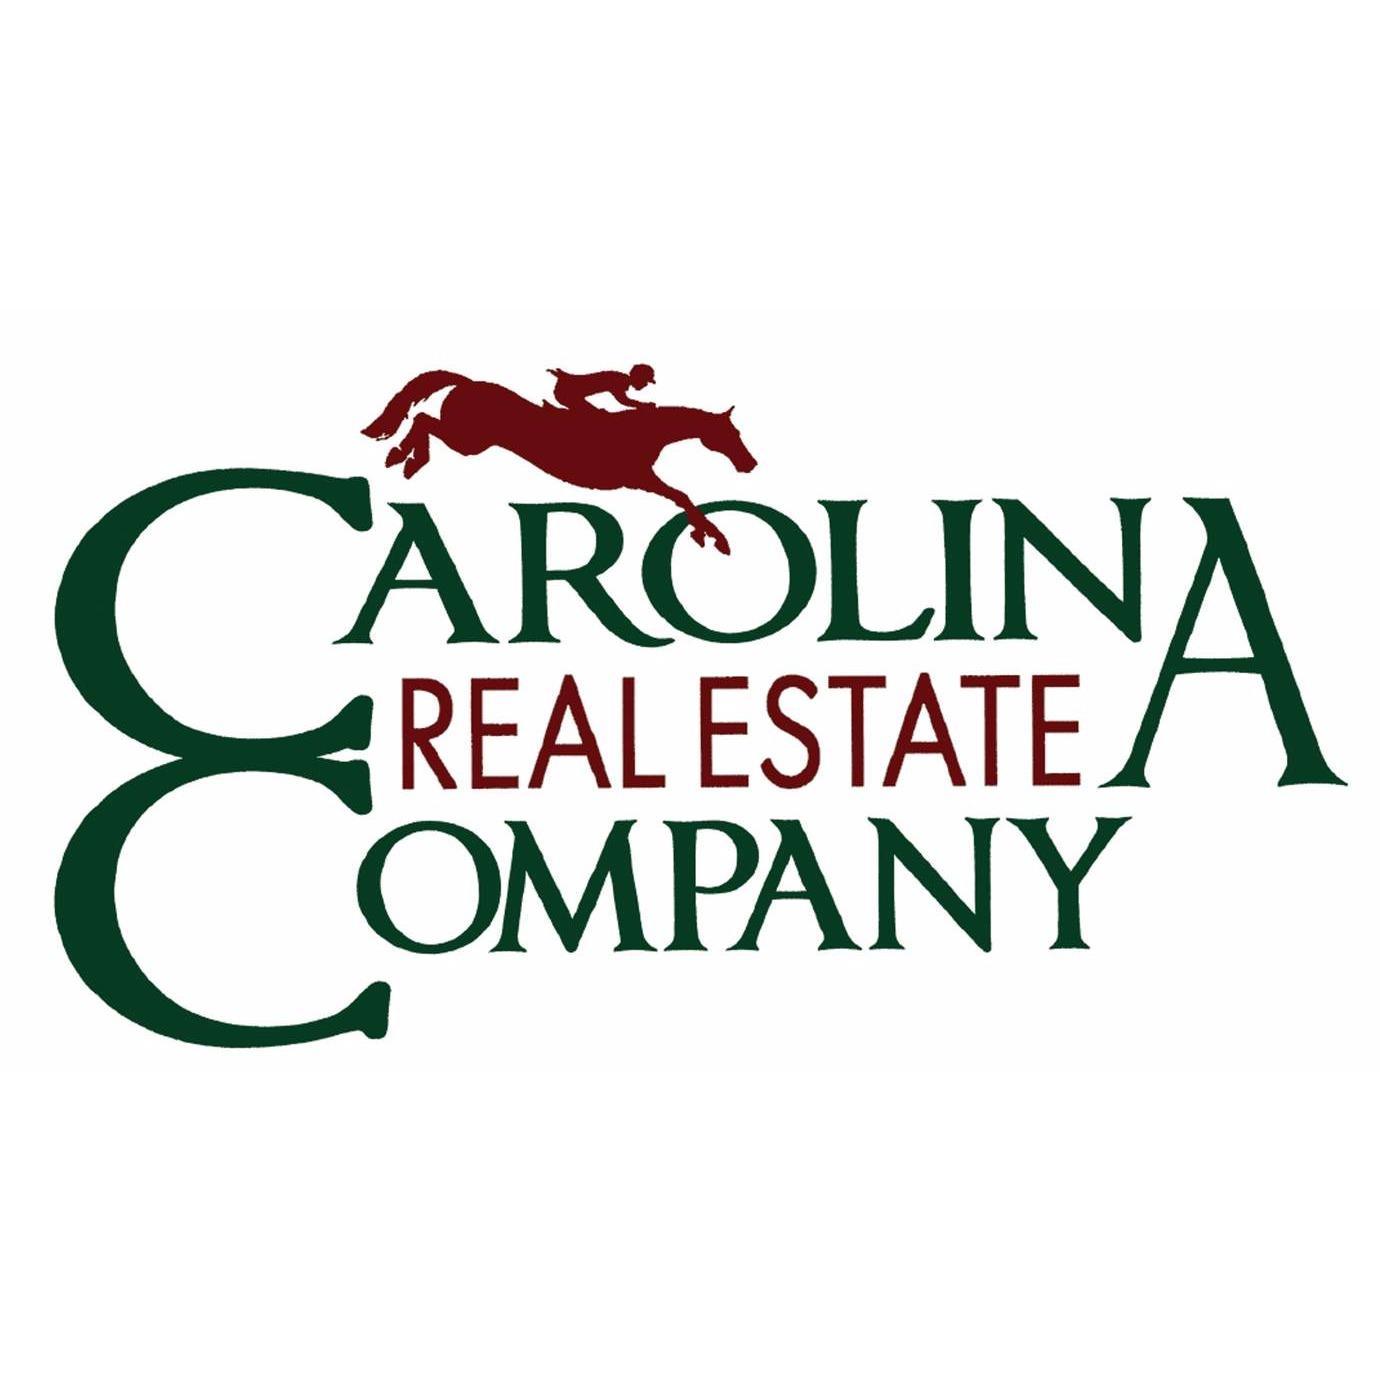 Randy Wolcott | Carolina Real Estate Company